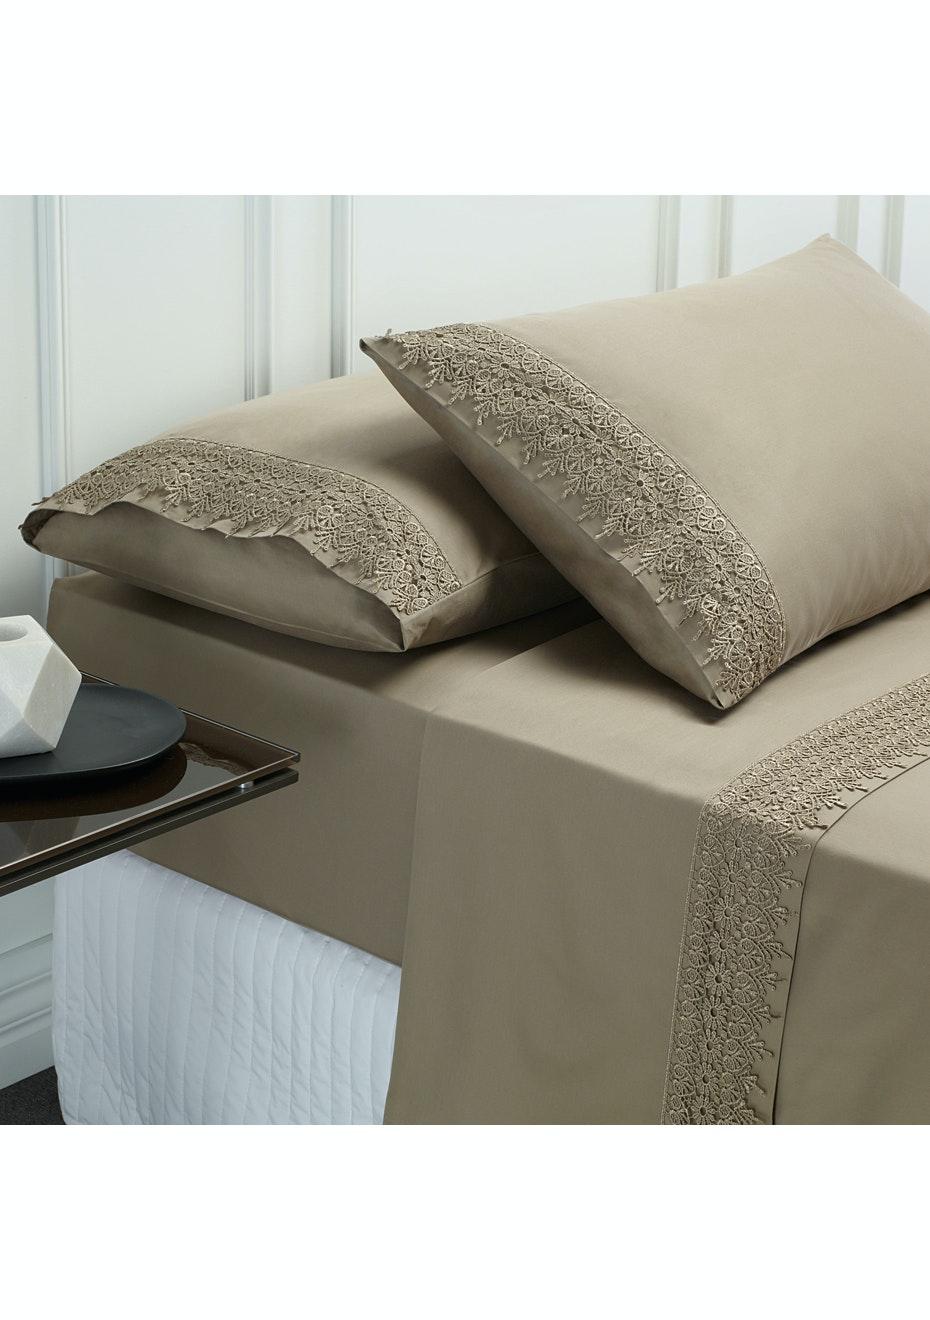 Style & Co 1000 Thread count Egyptian Cotton Hotel Collection Valencia Sheet sets Mega King Linen